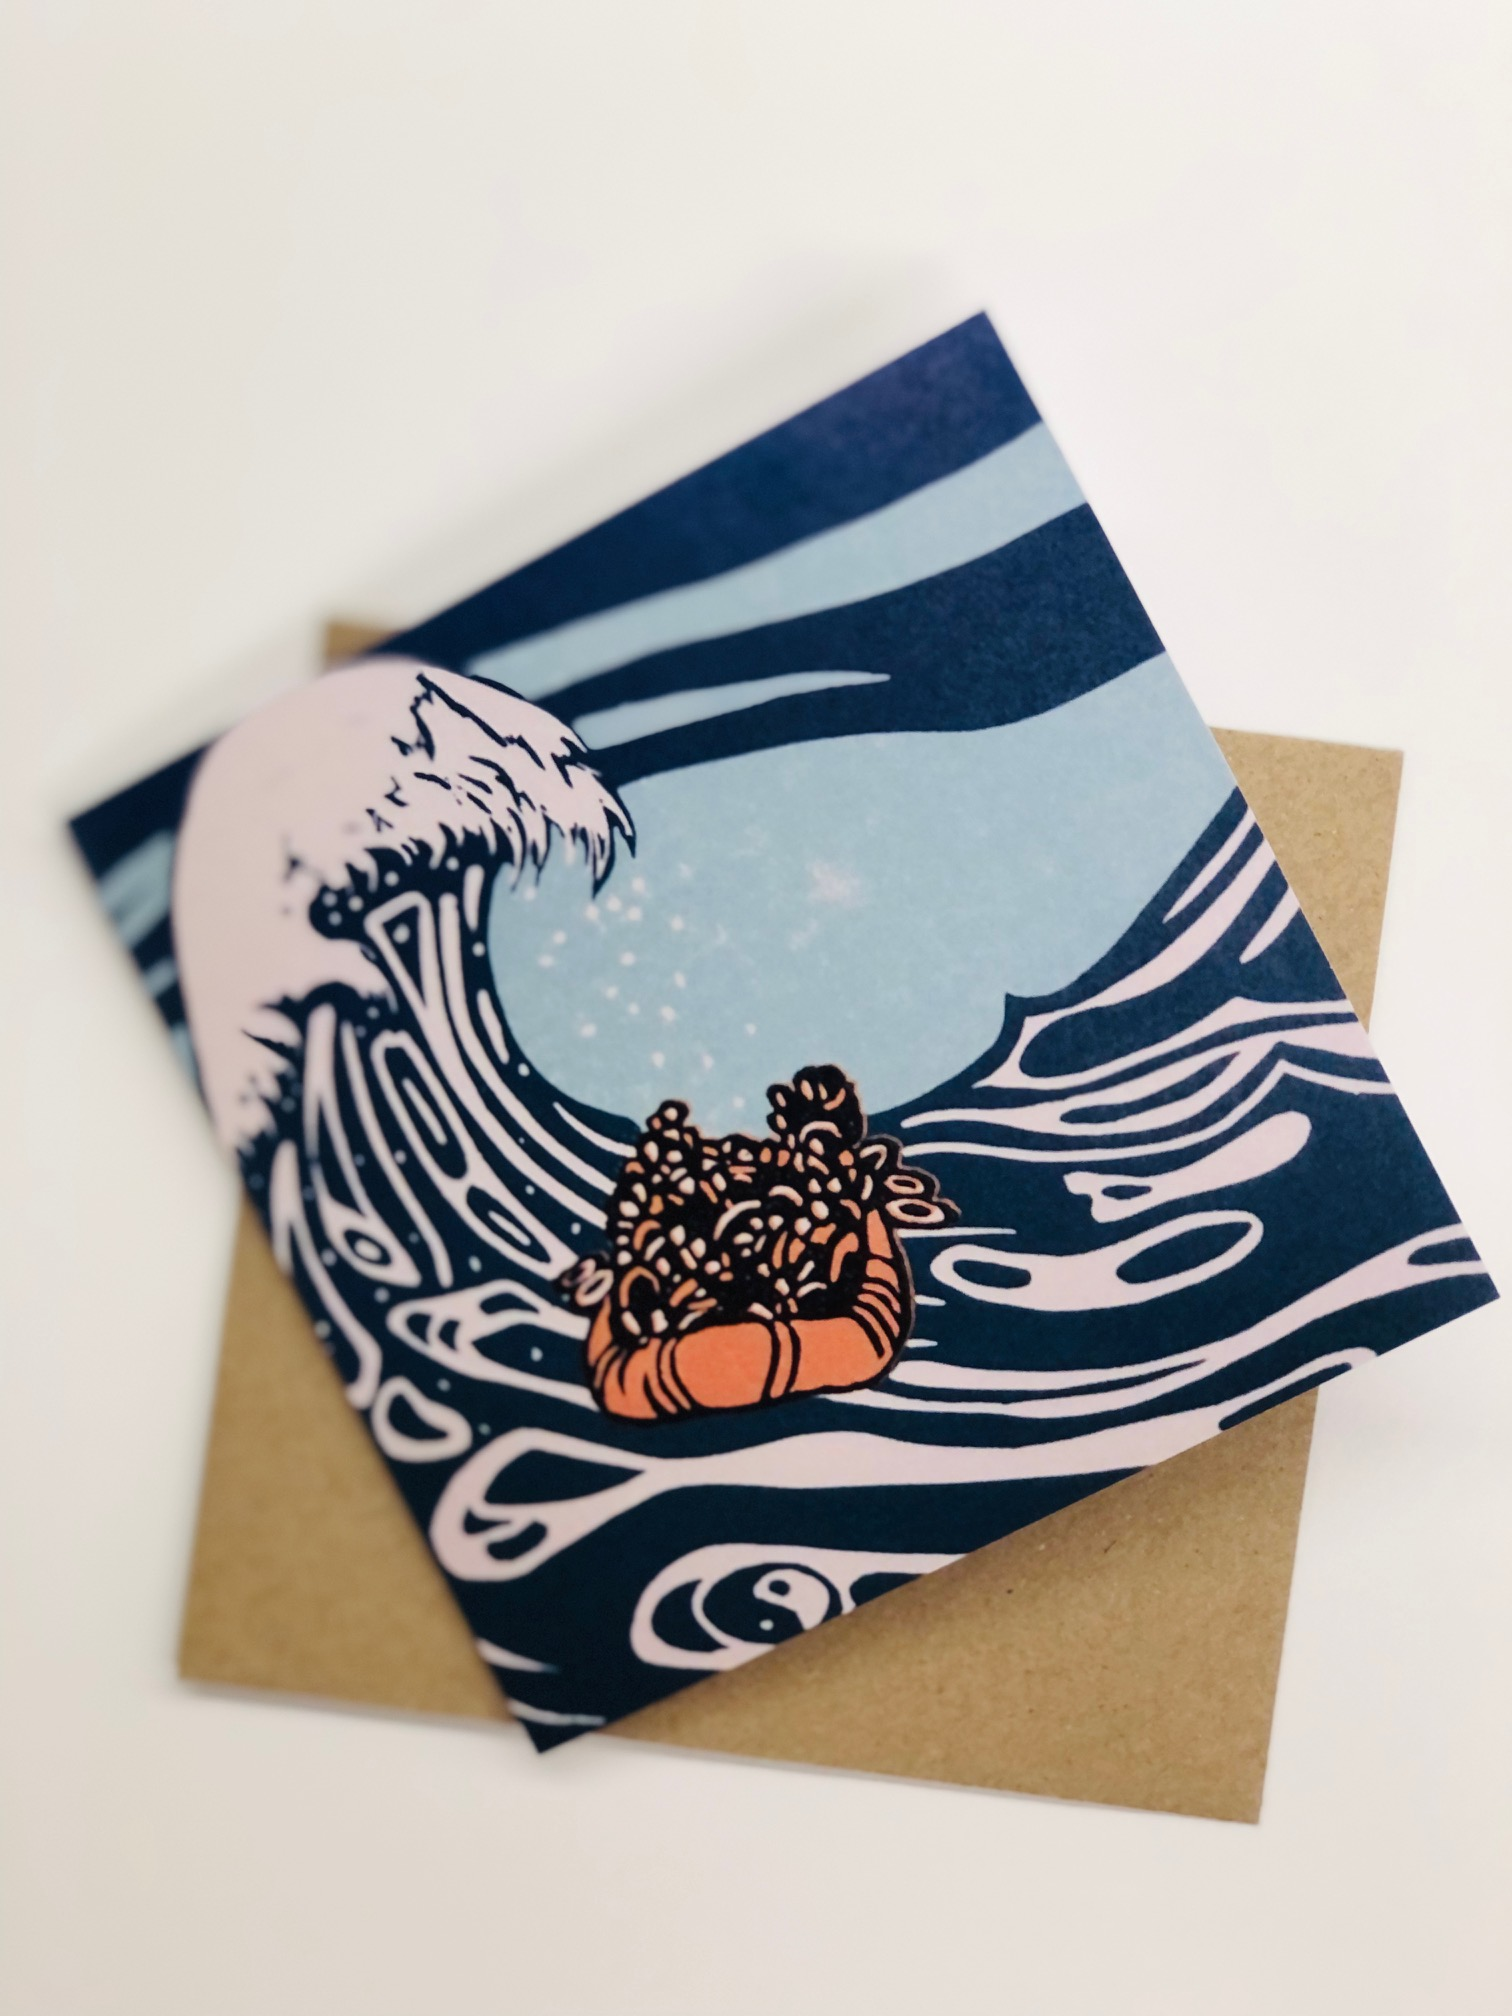 Hope and Despair greetings card by Aylsa Williams